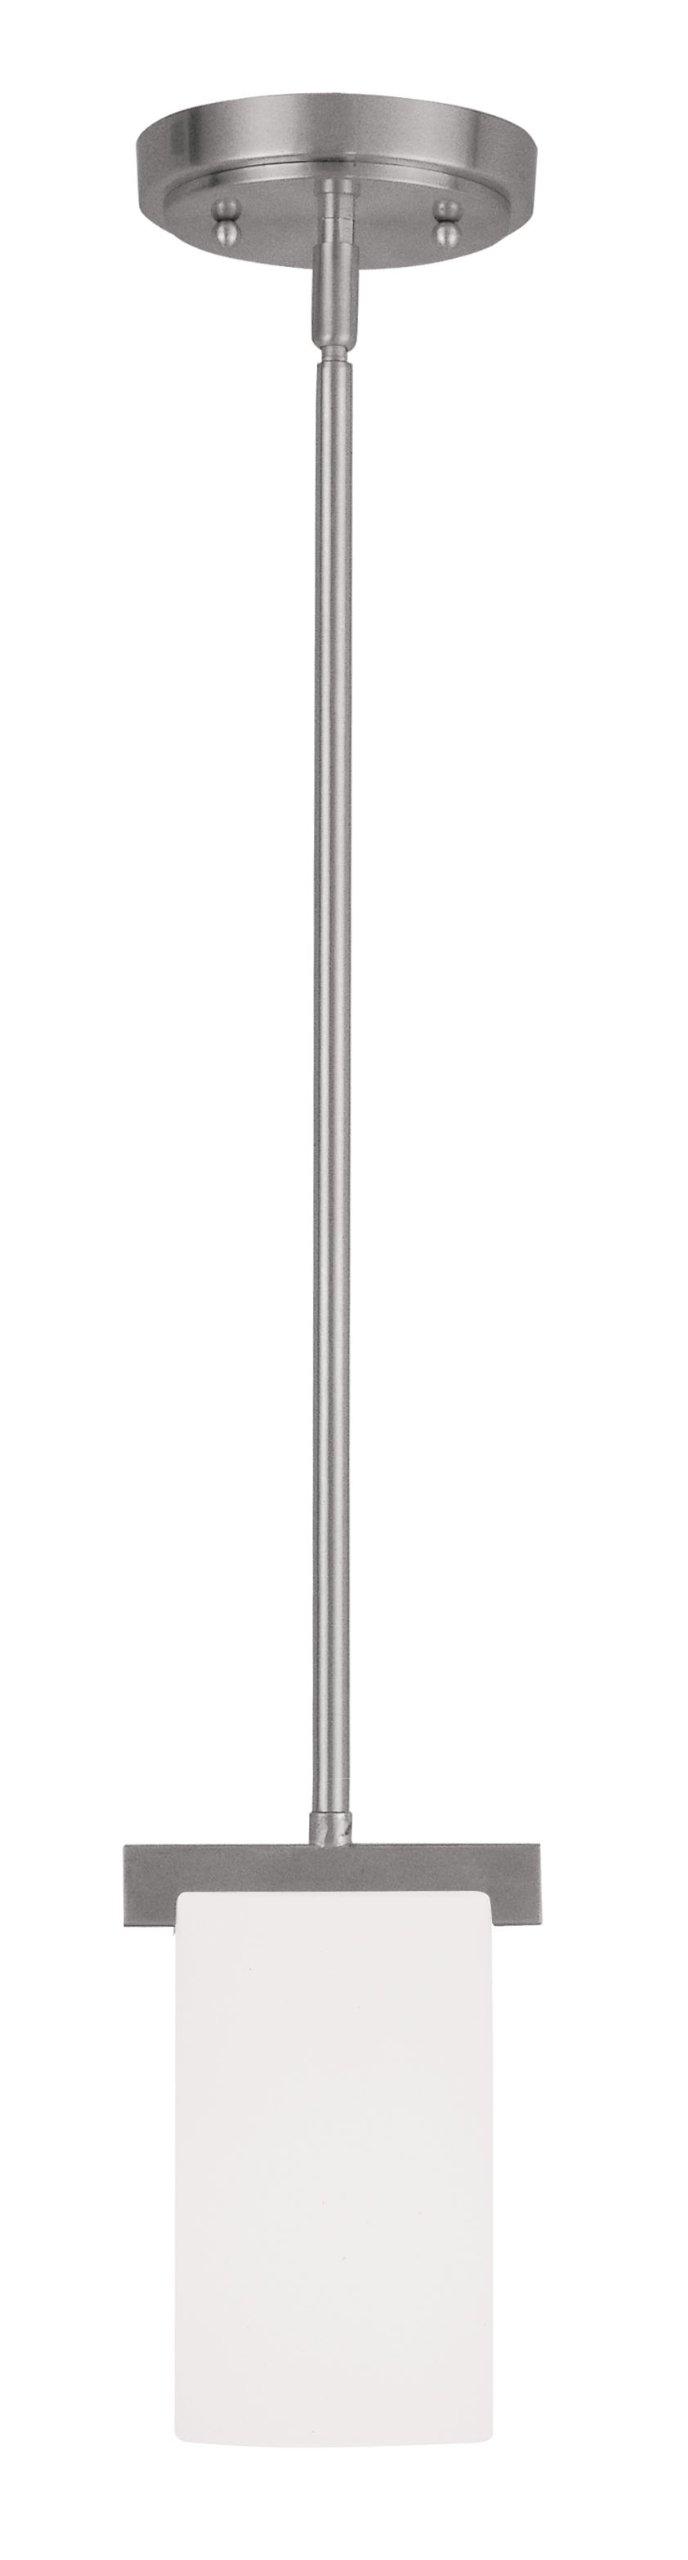 Livex Lighting 1321-91 Astoria Mini Pendant